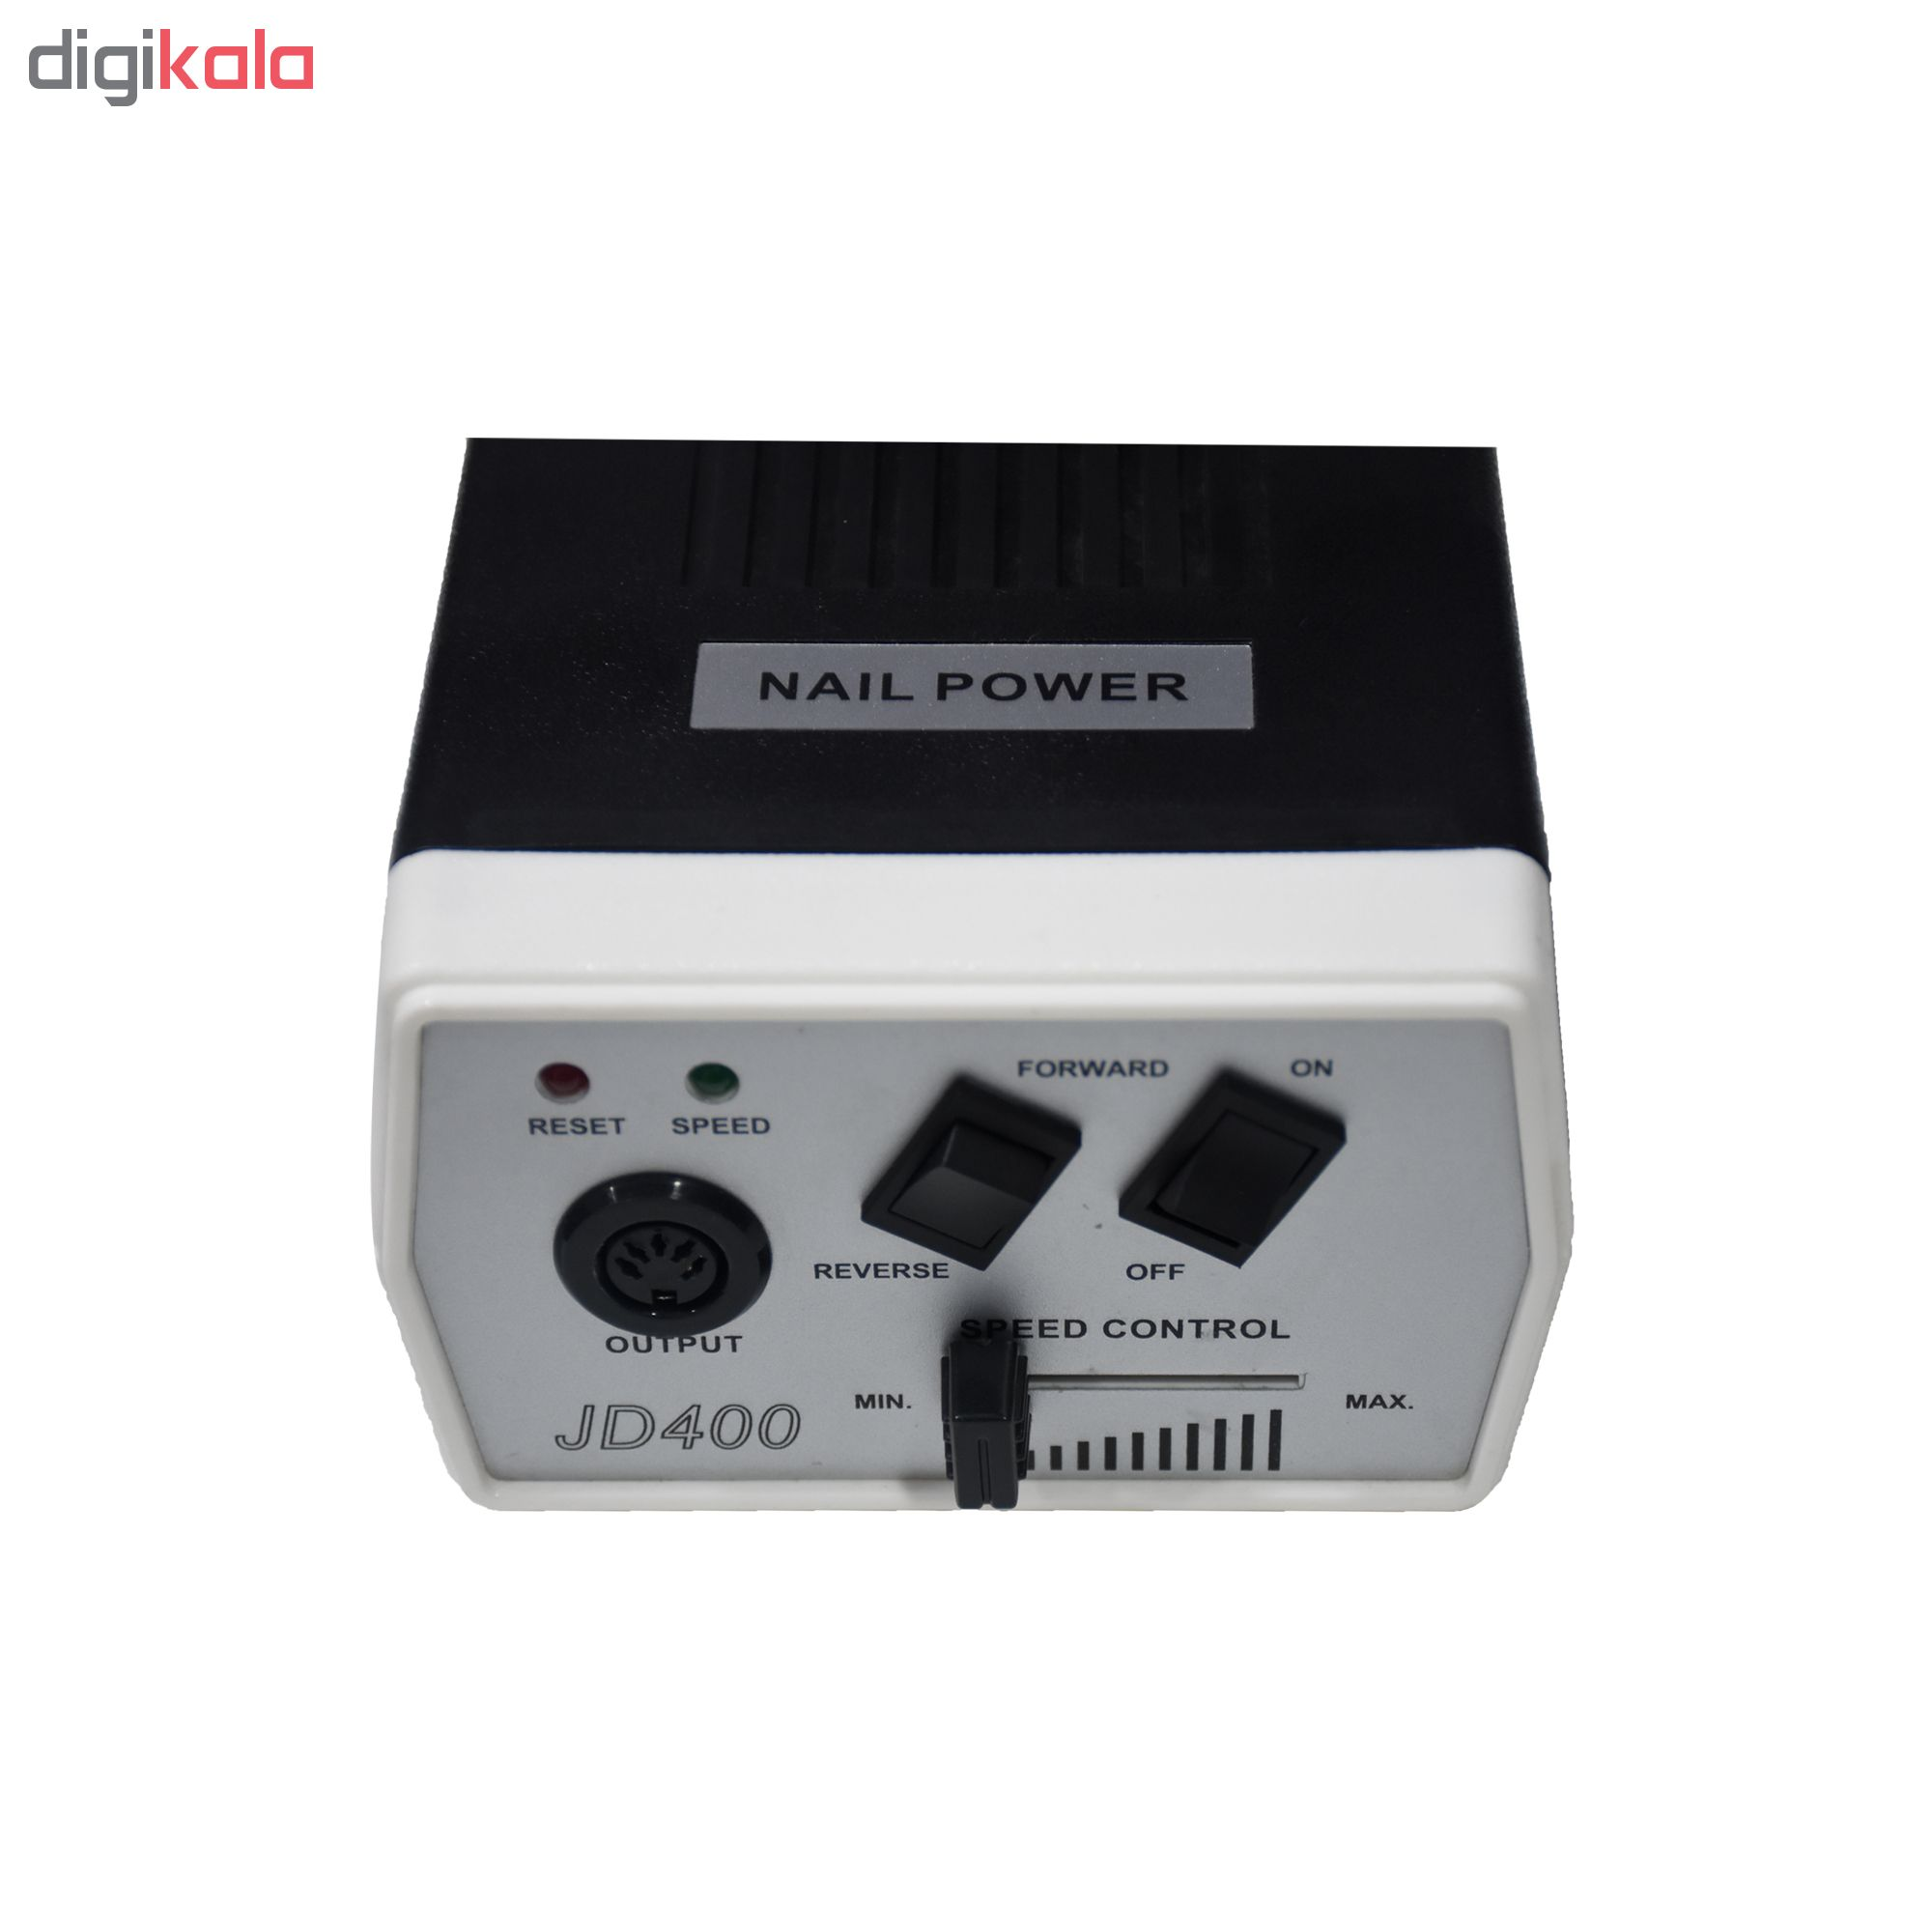 دستگاه مانیکور و پدیکور نیل پاور مدل JD400